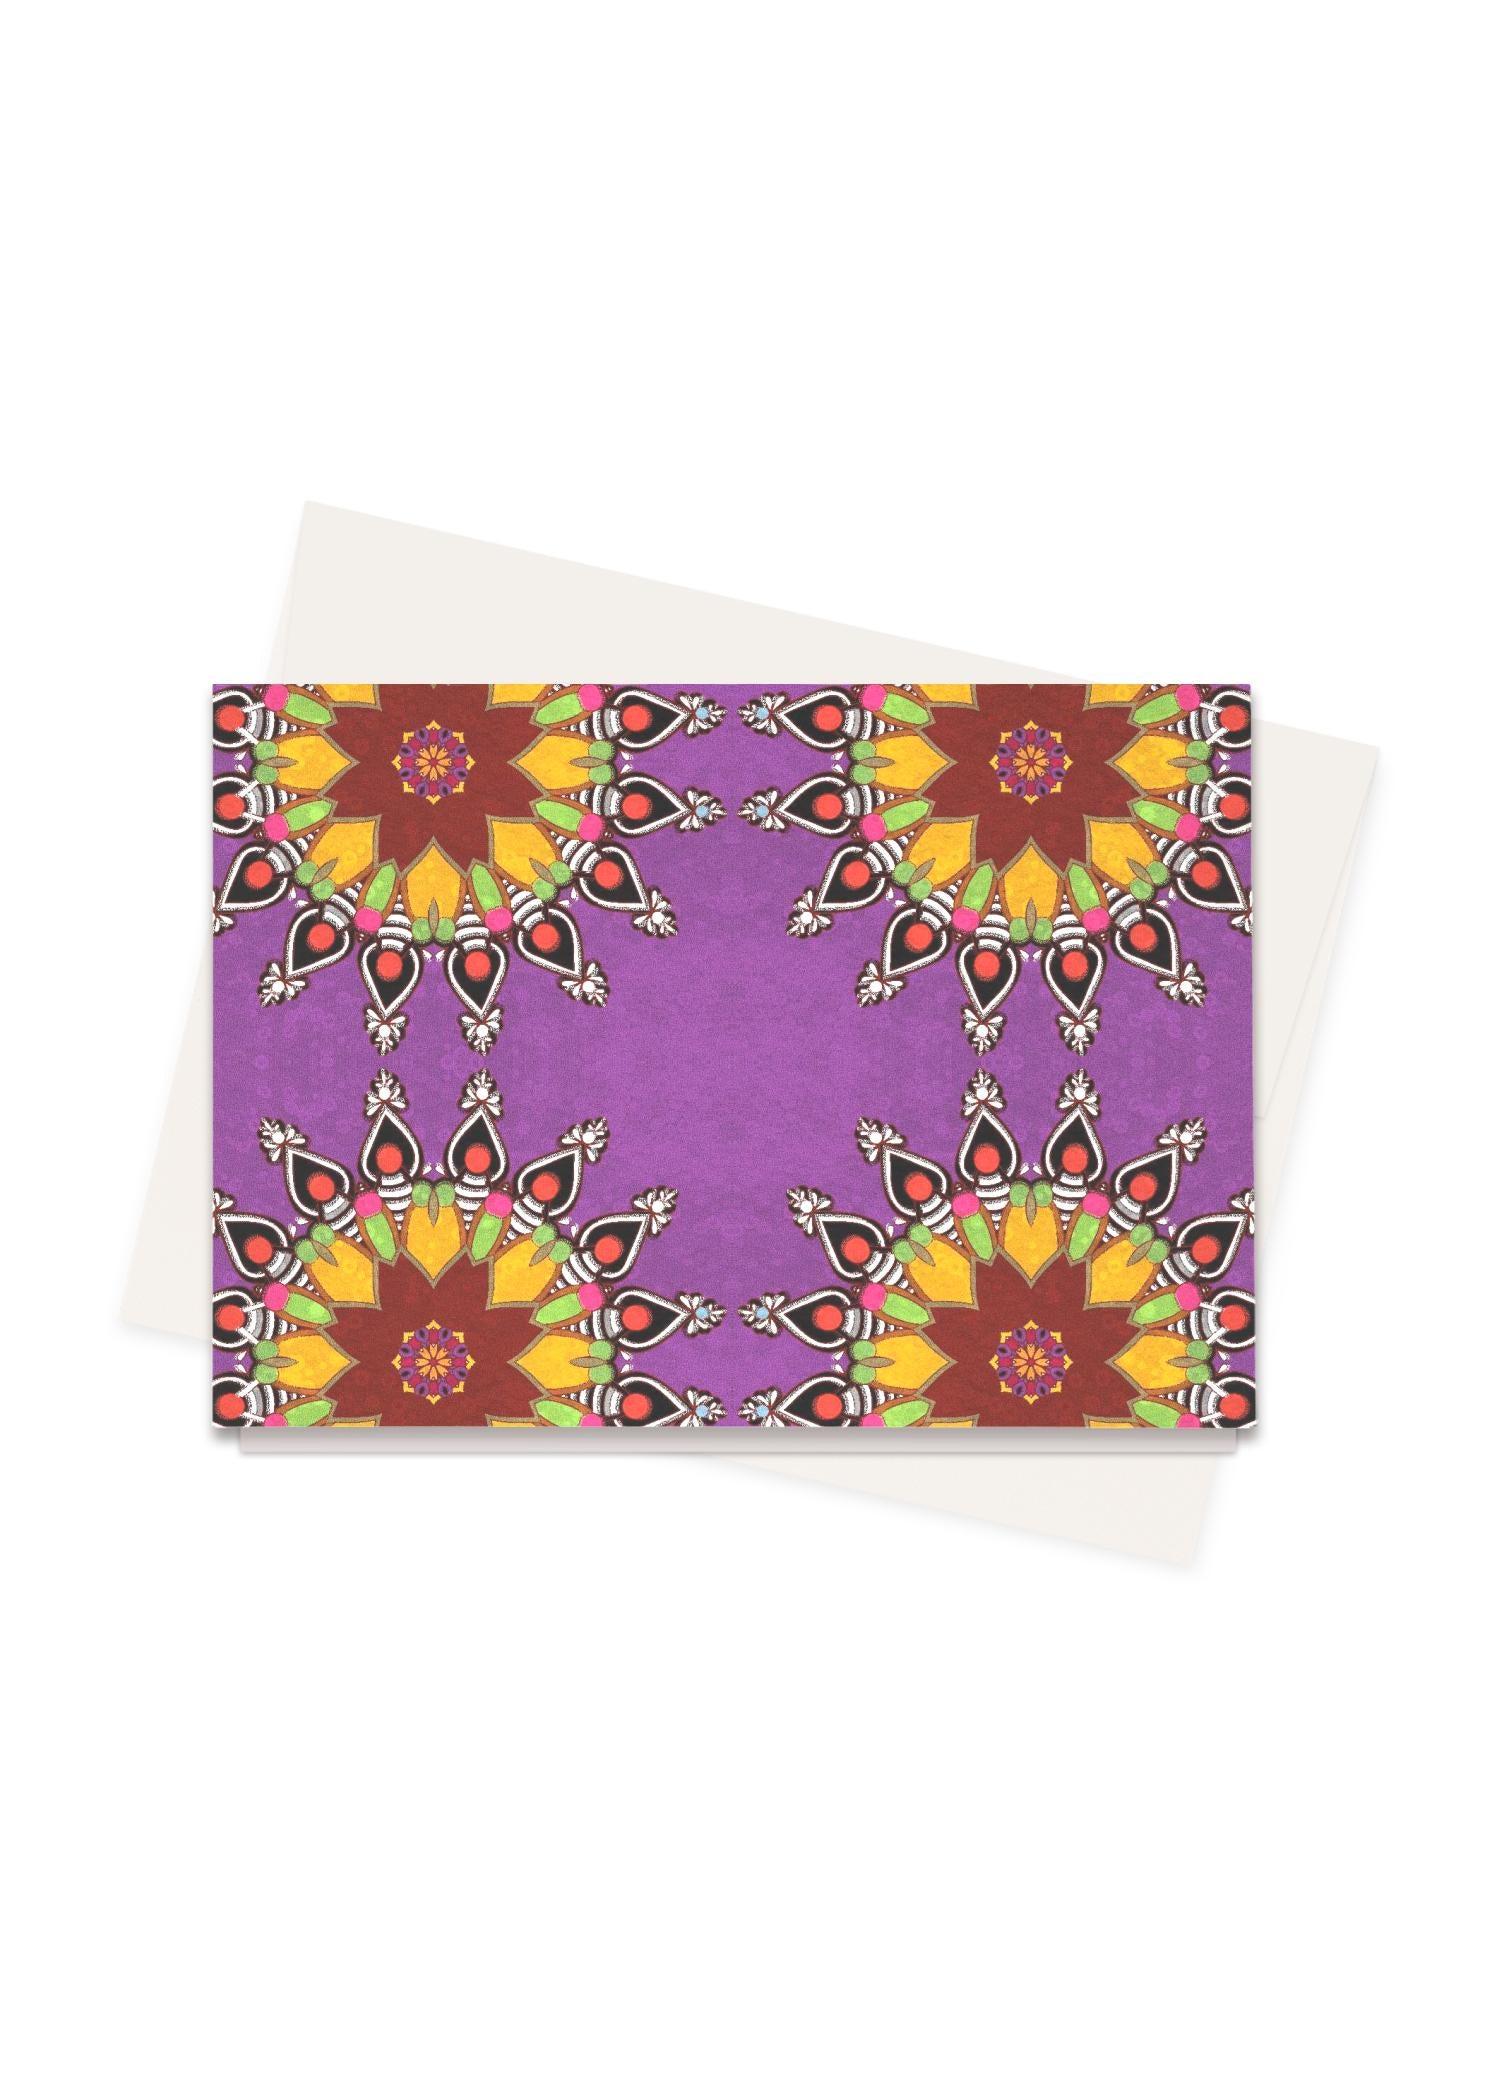 VIDA Greeting Cards Set - The Mandala Pillow by VIDA Original Artist  - Size: Set of 8